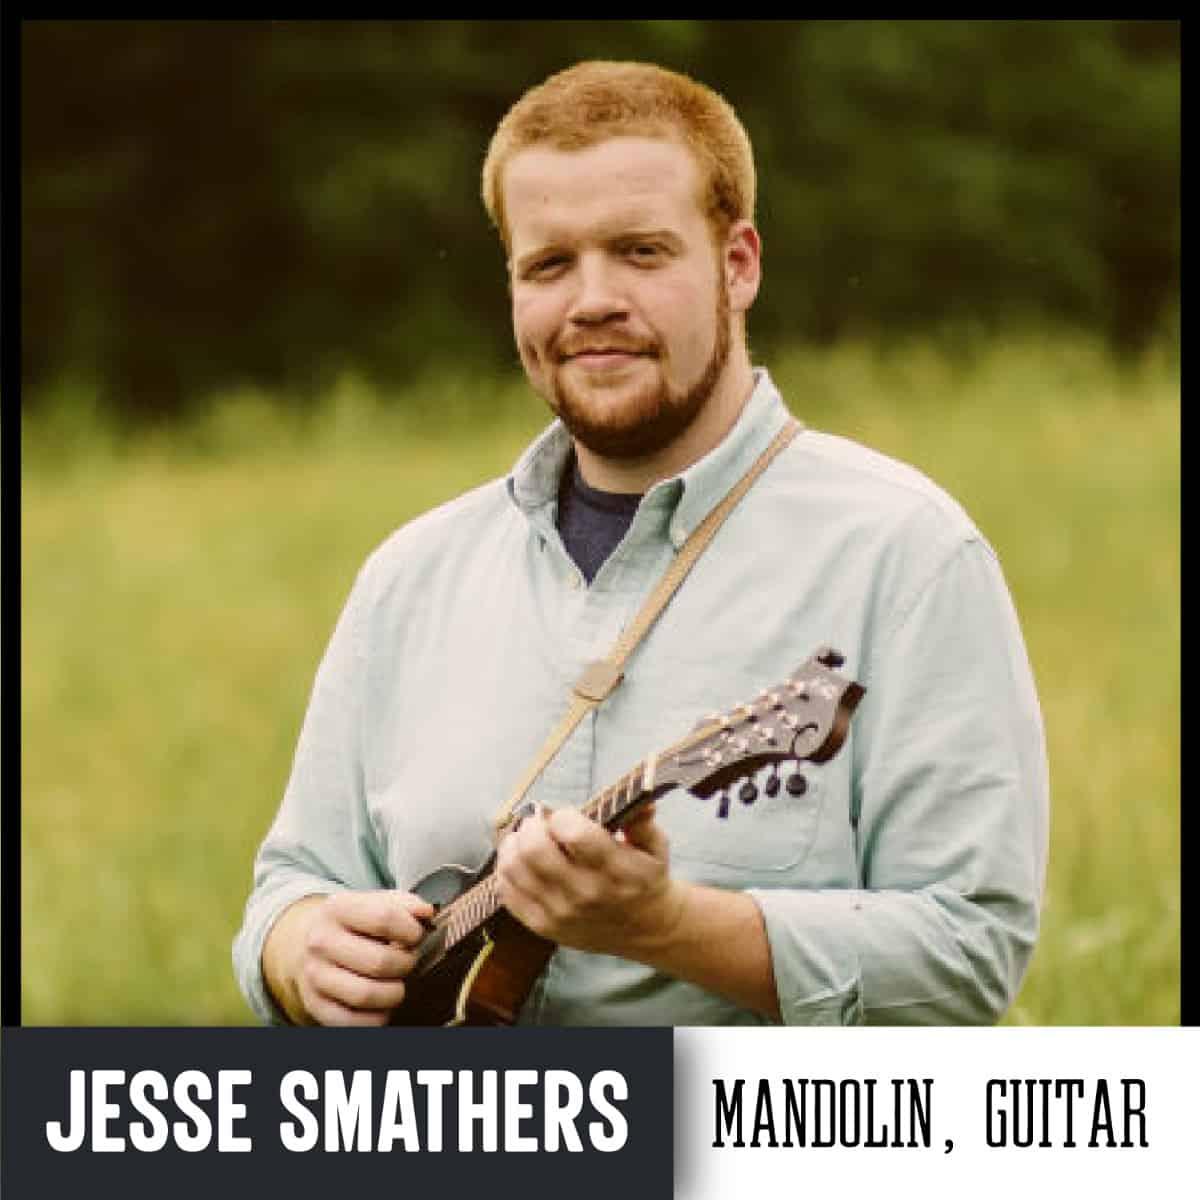 Handmade Music School Teacher Jesse Smathers